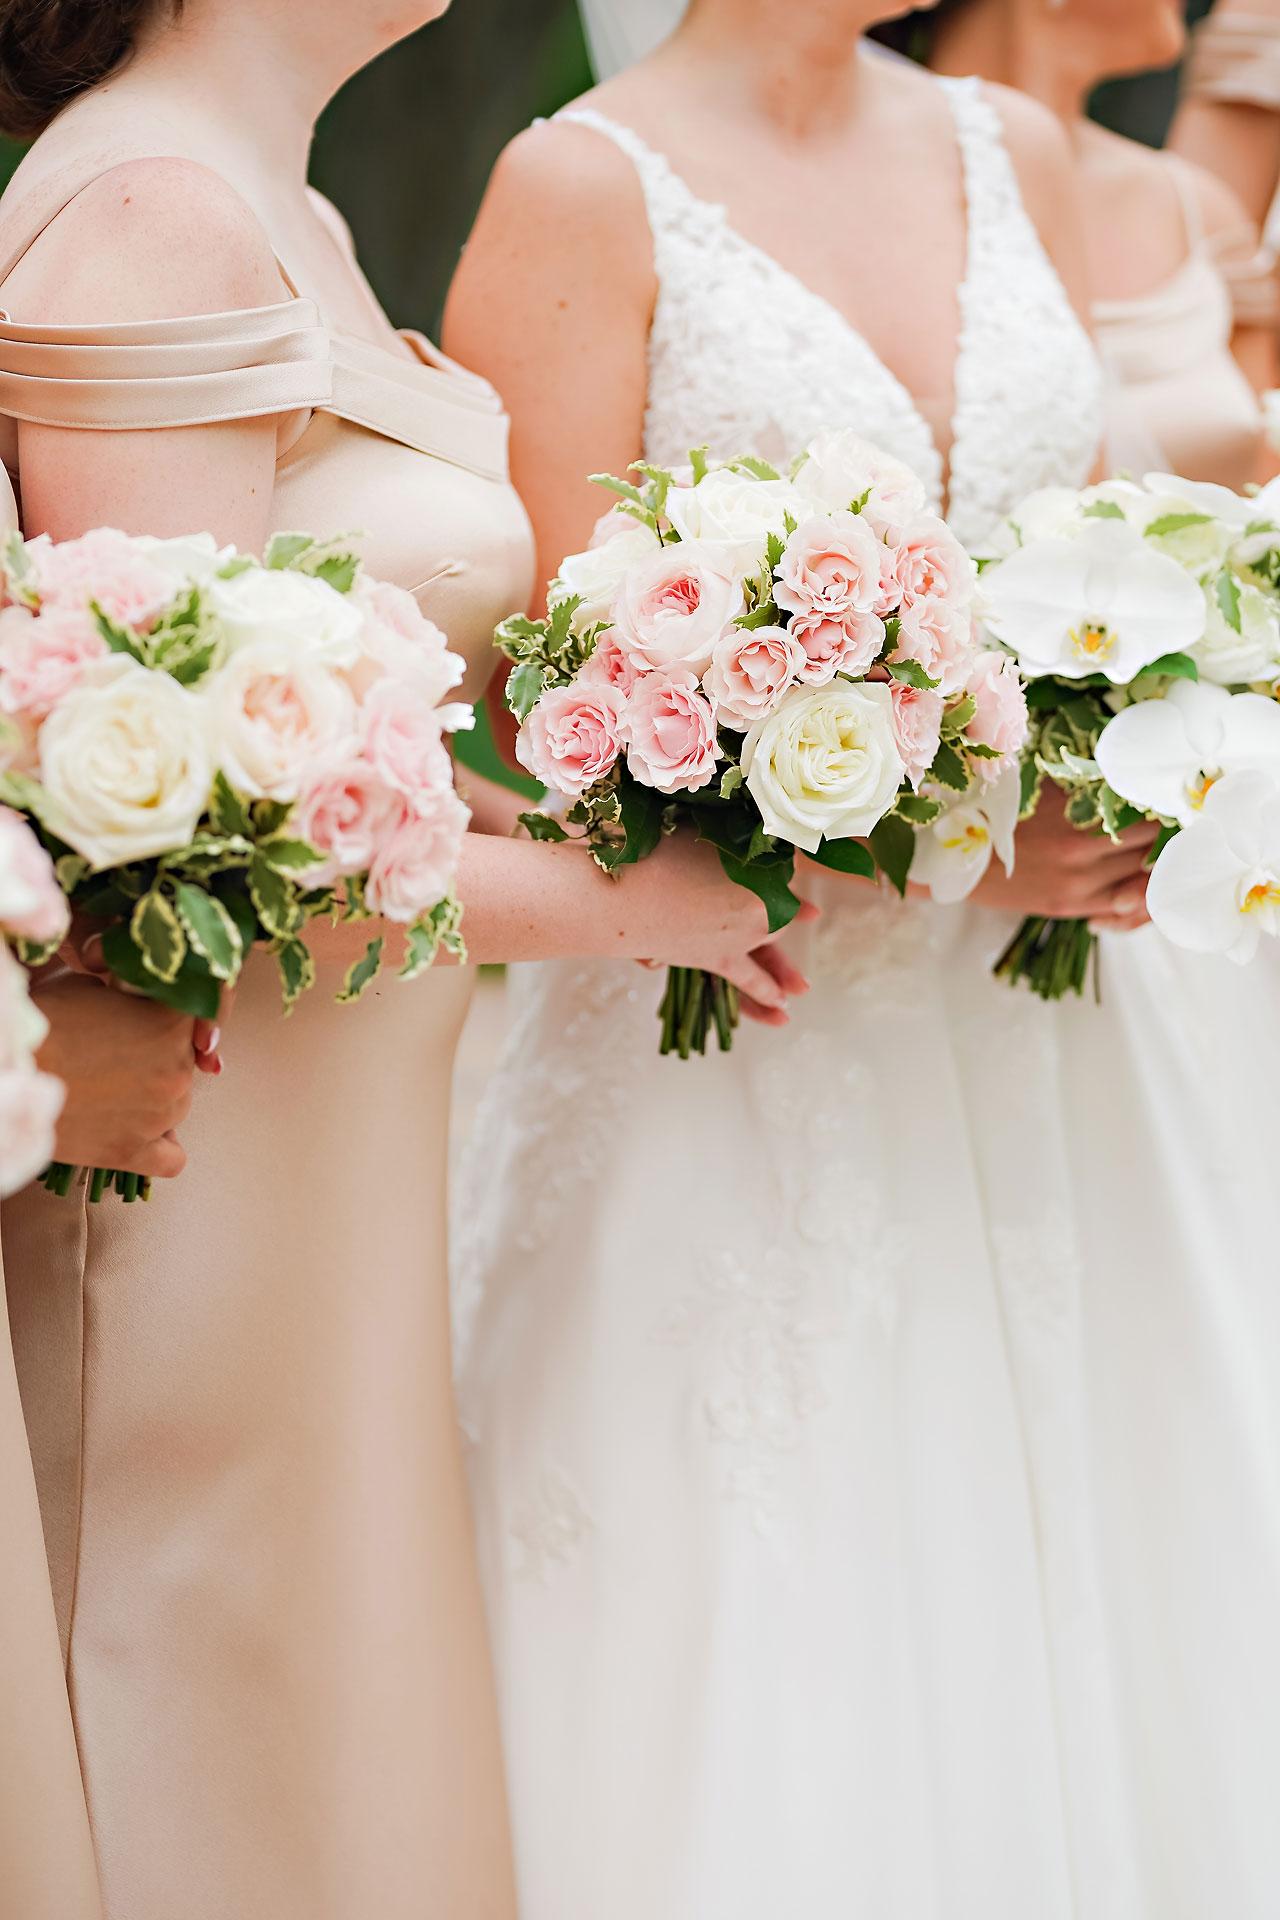 Michelle Casey Palais Royale South Bend Wedding 056